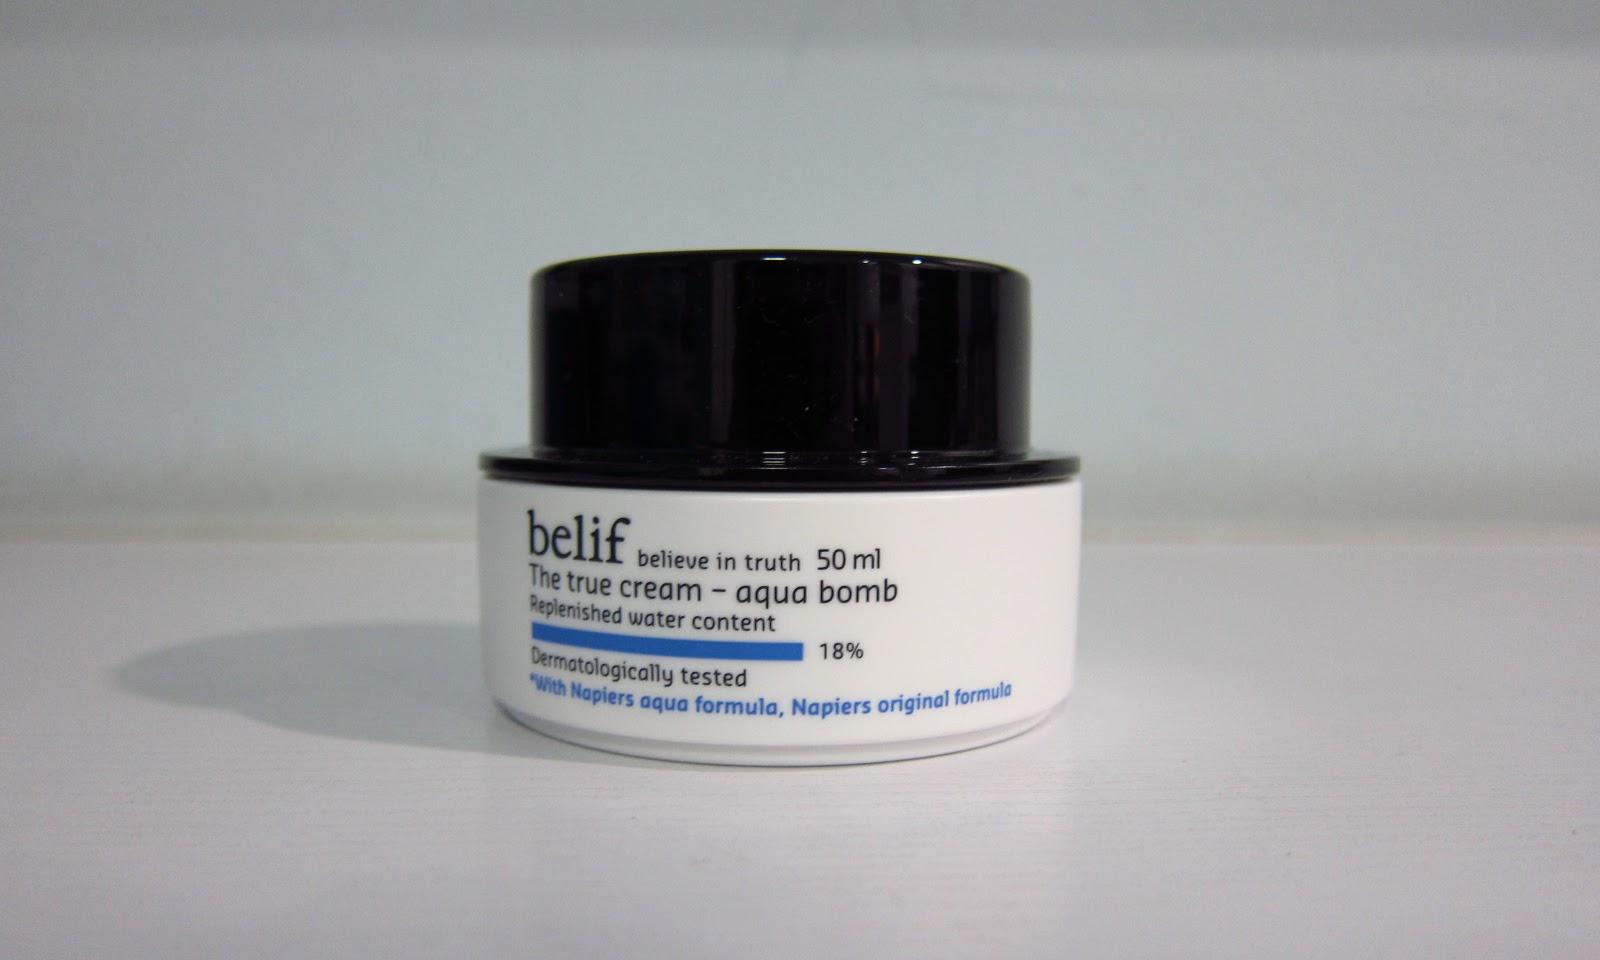 Belif's Peat Aqua Bomb Moisturizer